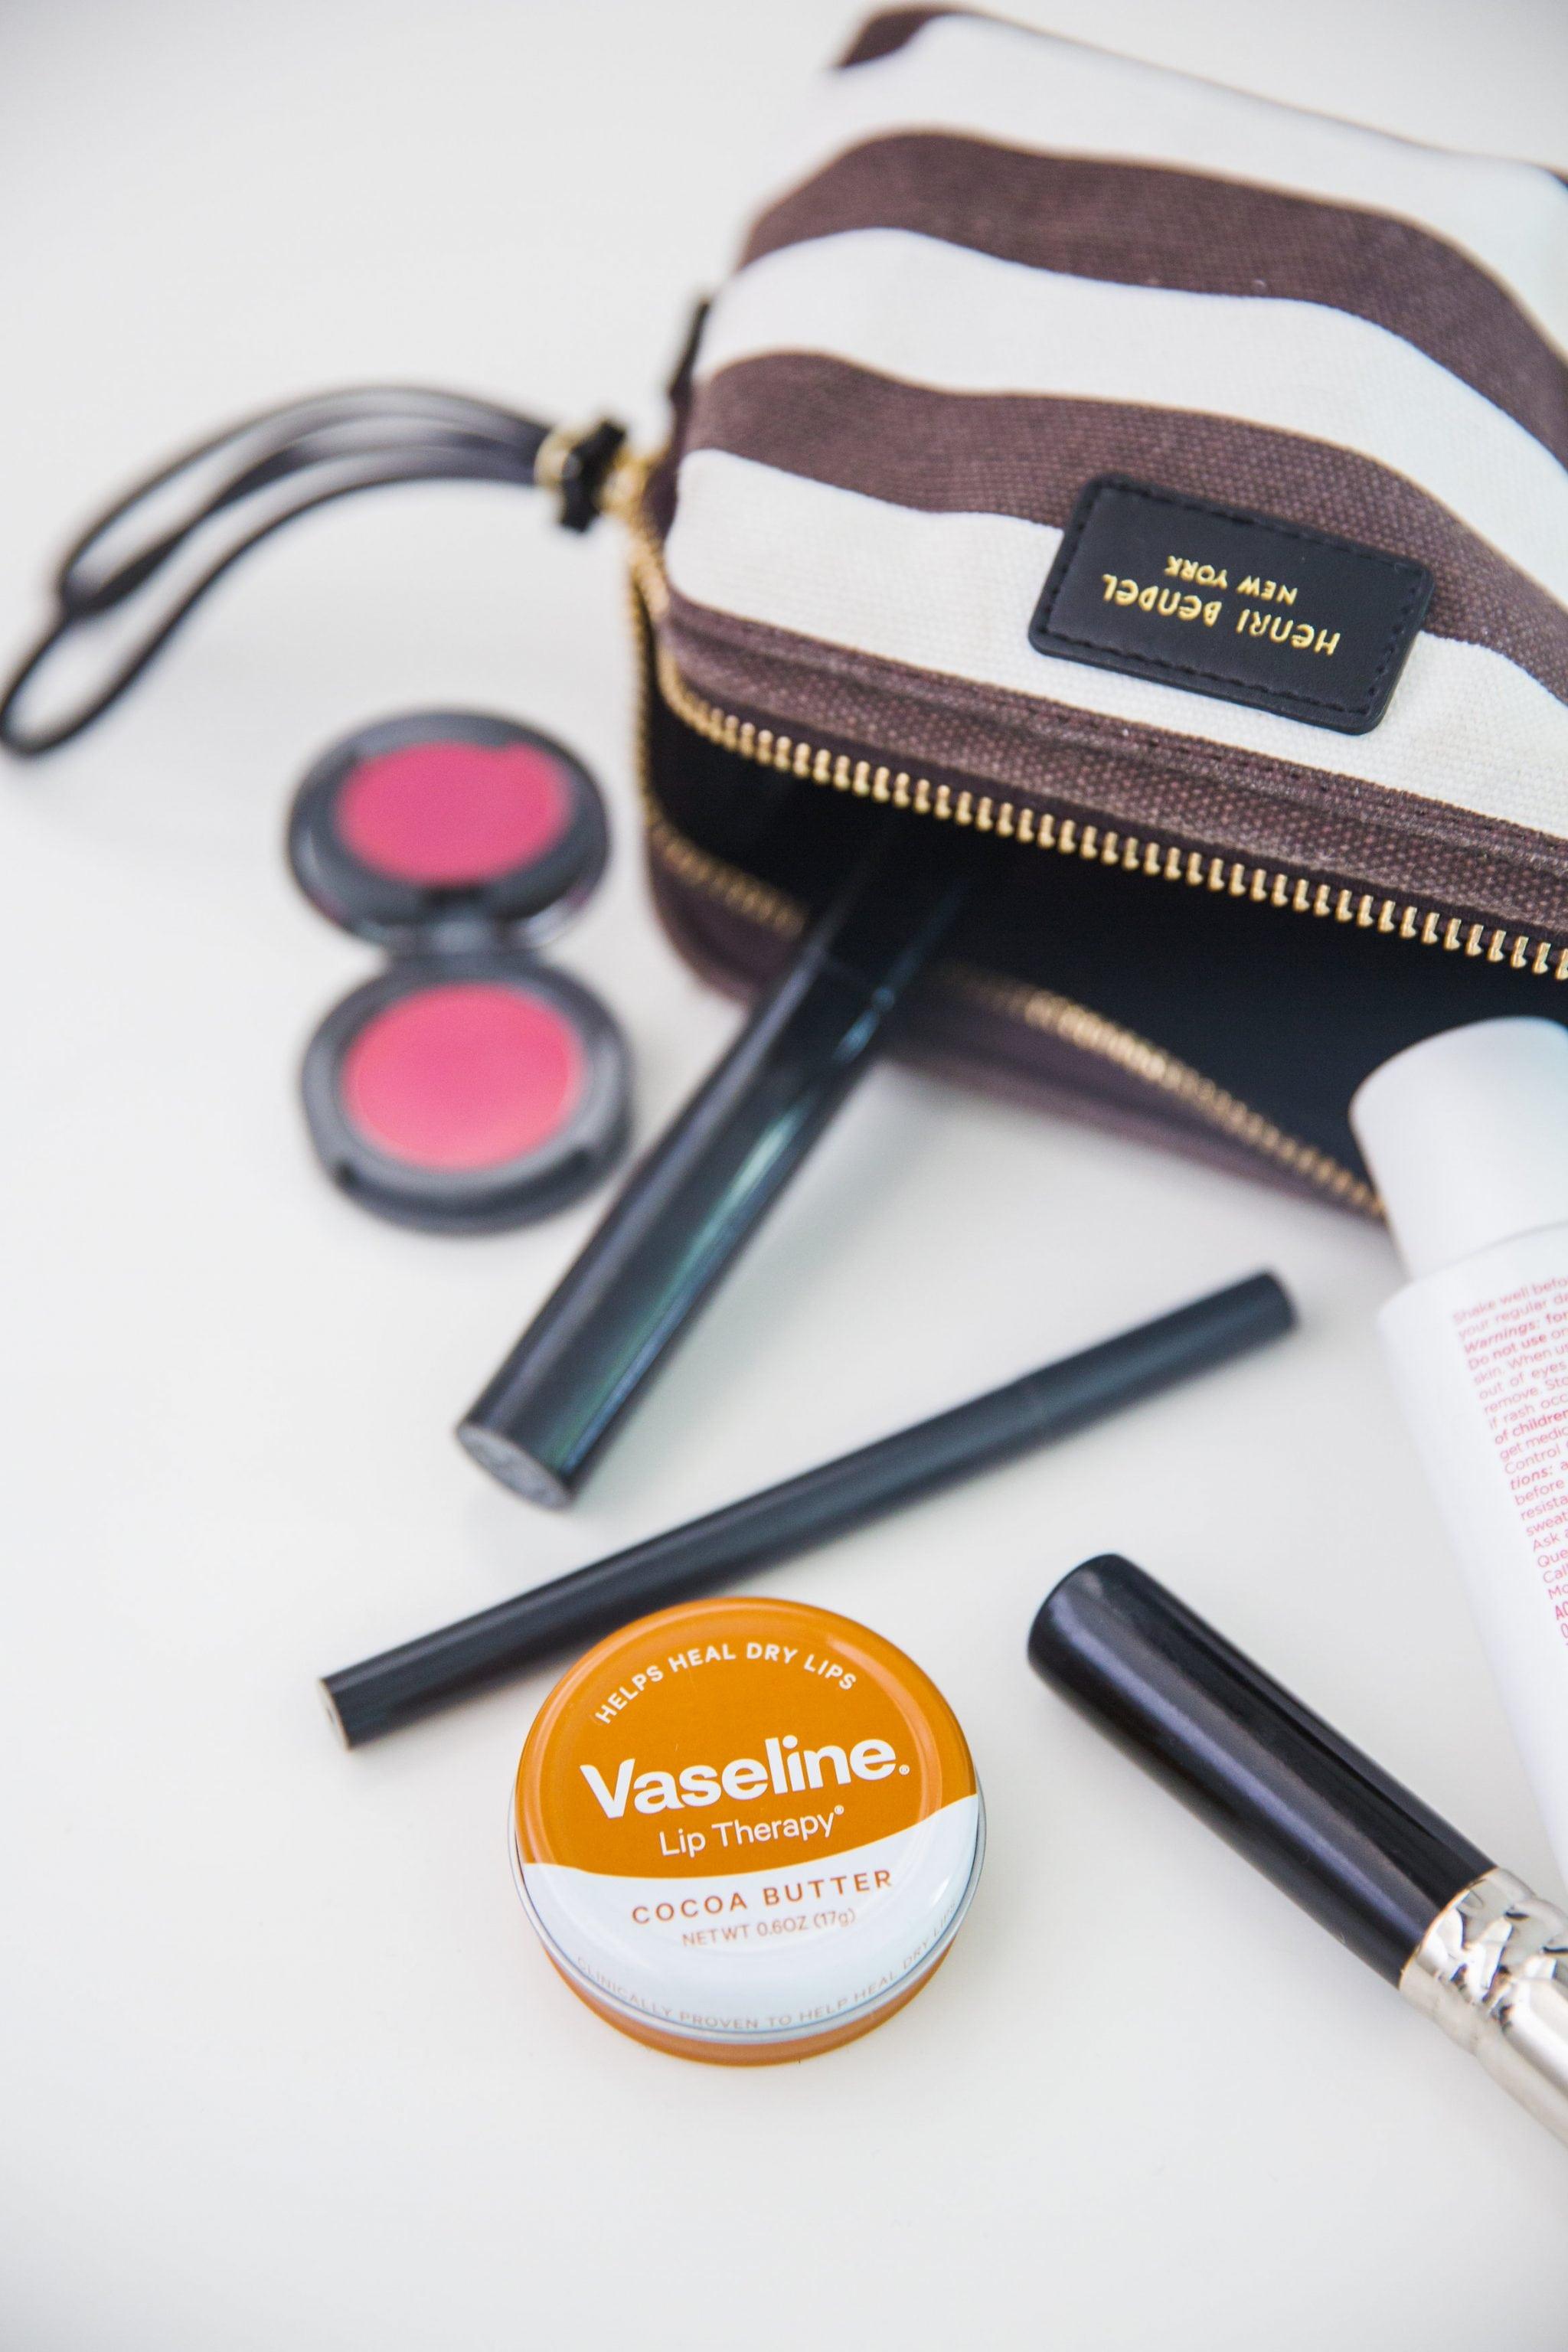 Inside the makeup bag